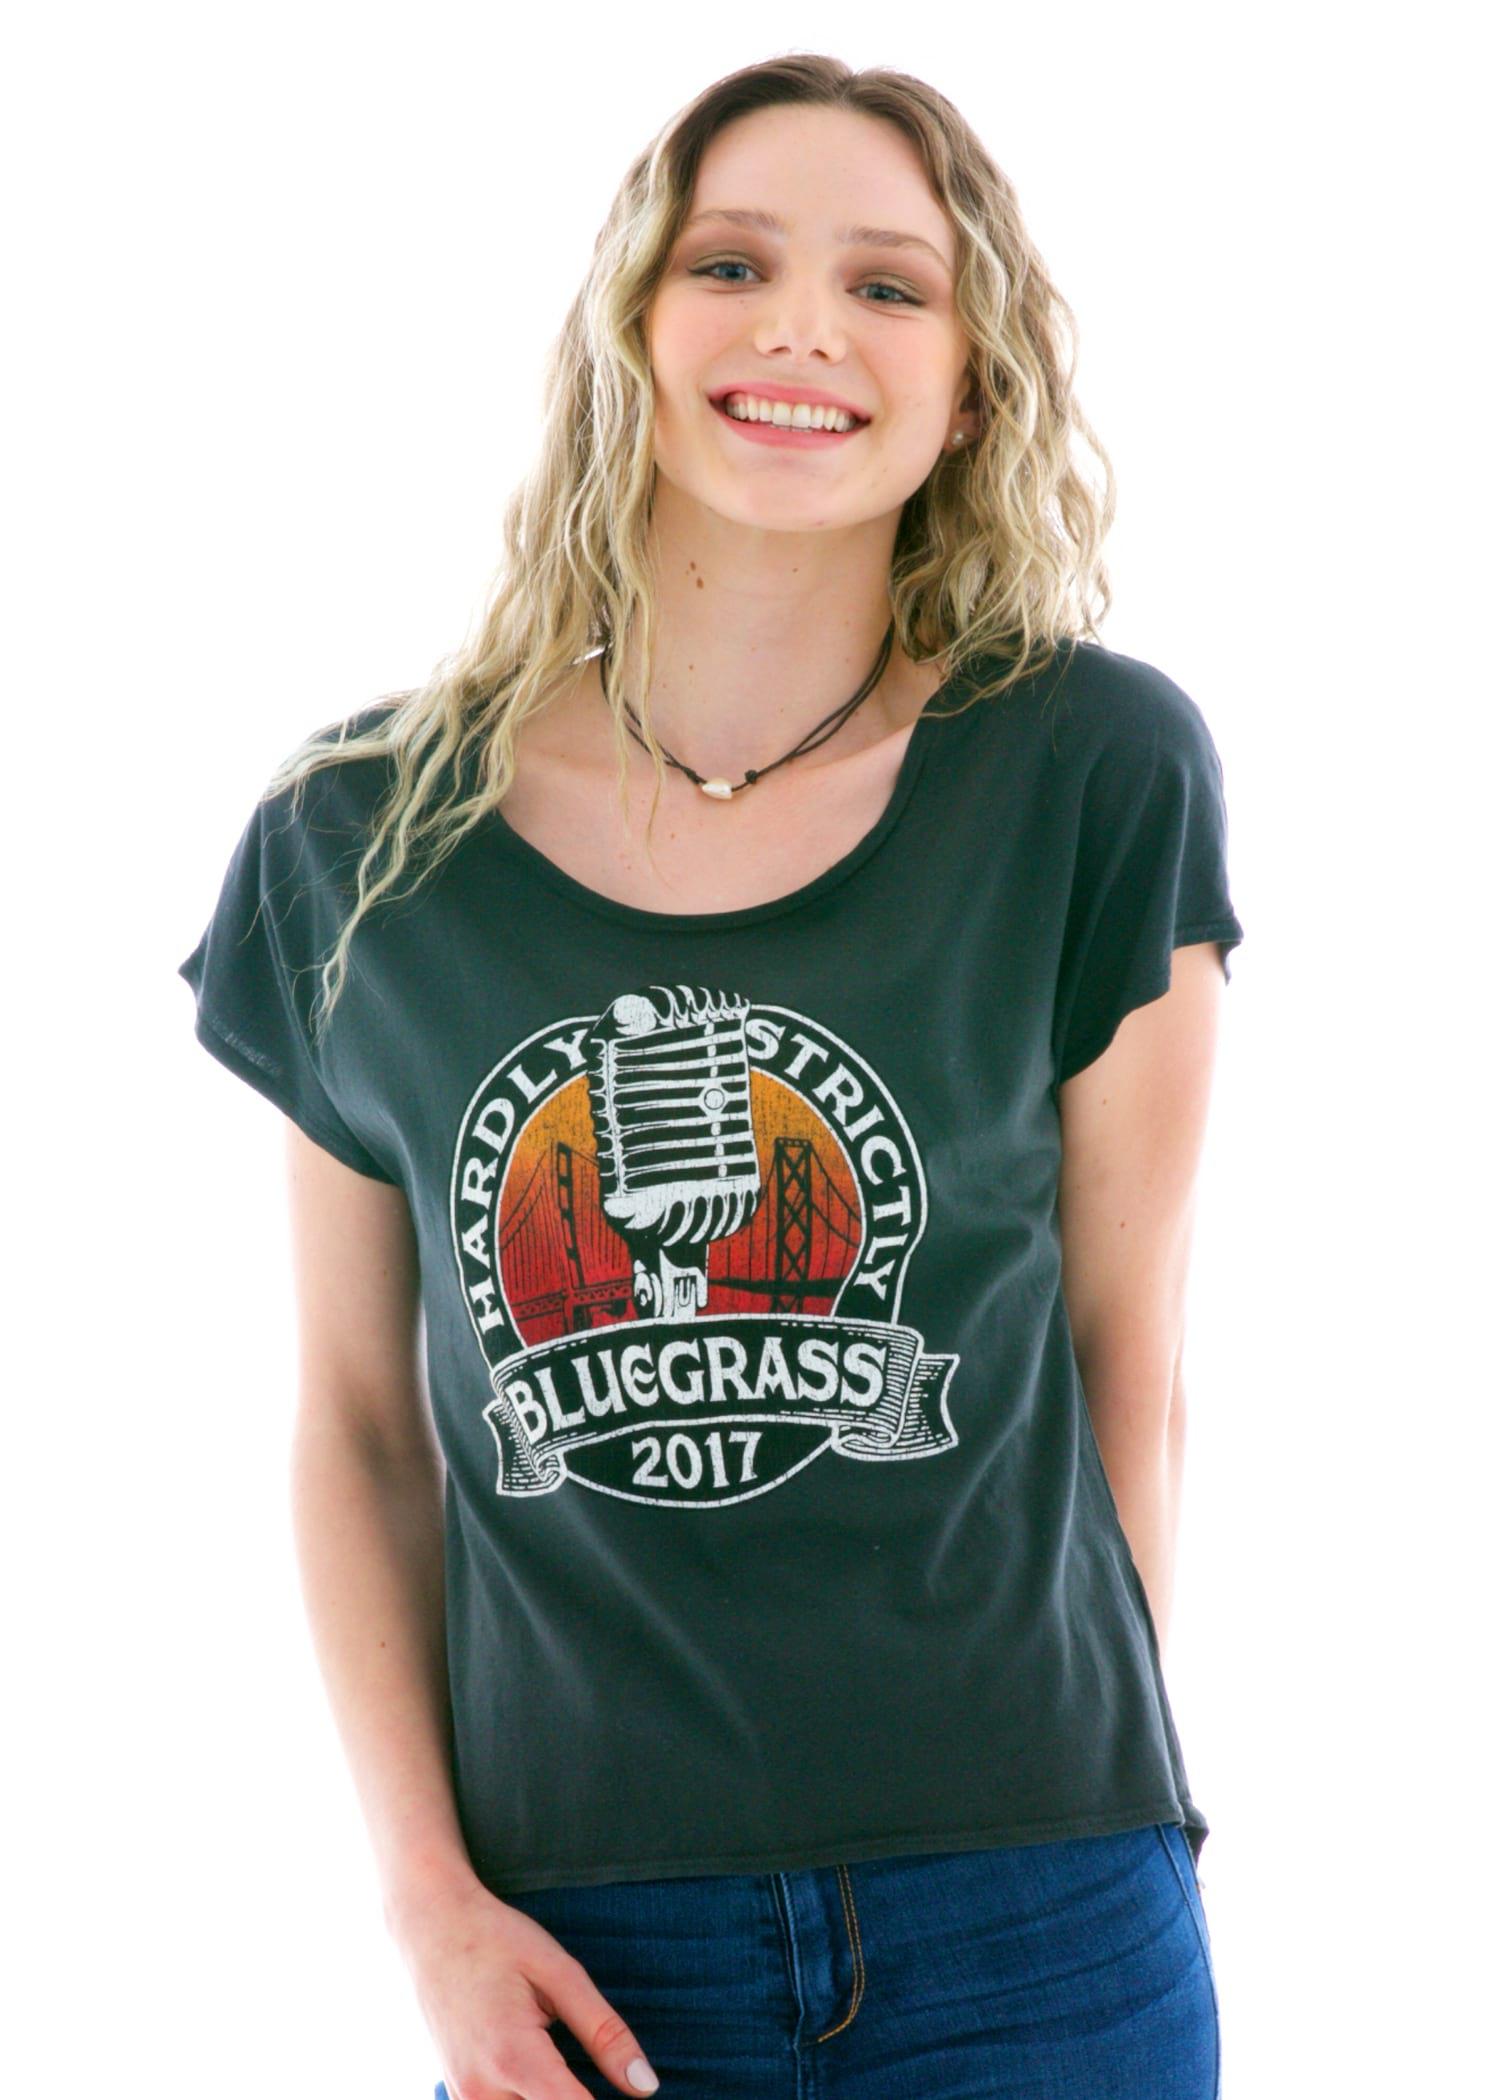 Women's Sleeveless Dolman Short Sleeve T-Shirt